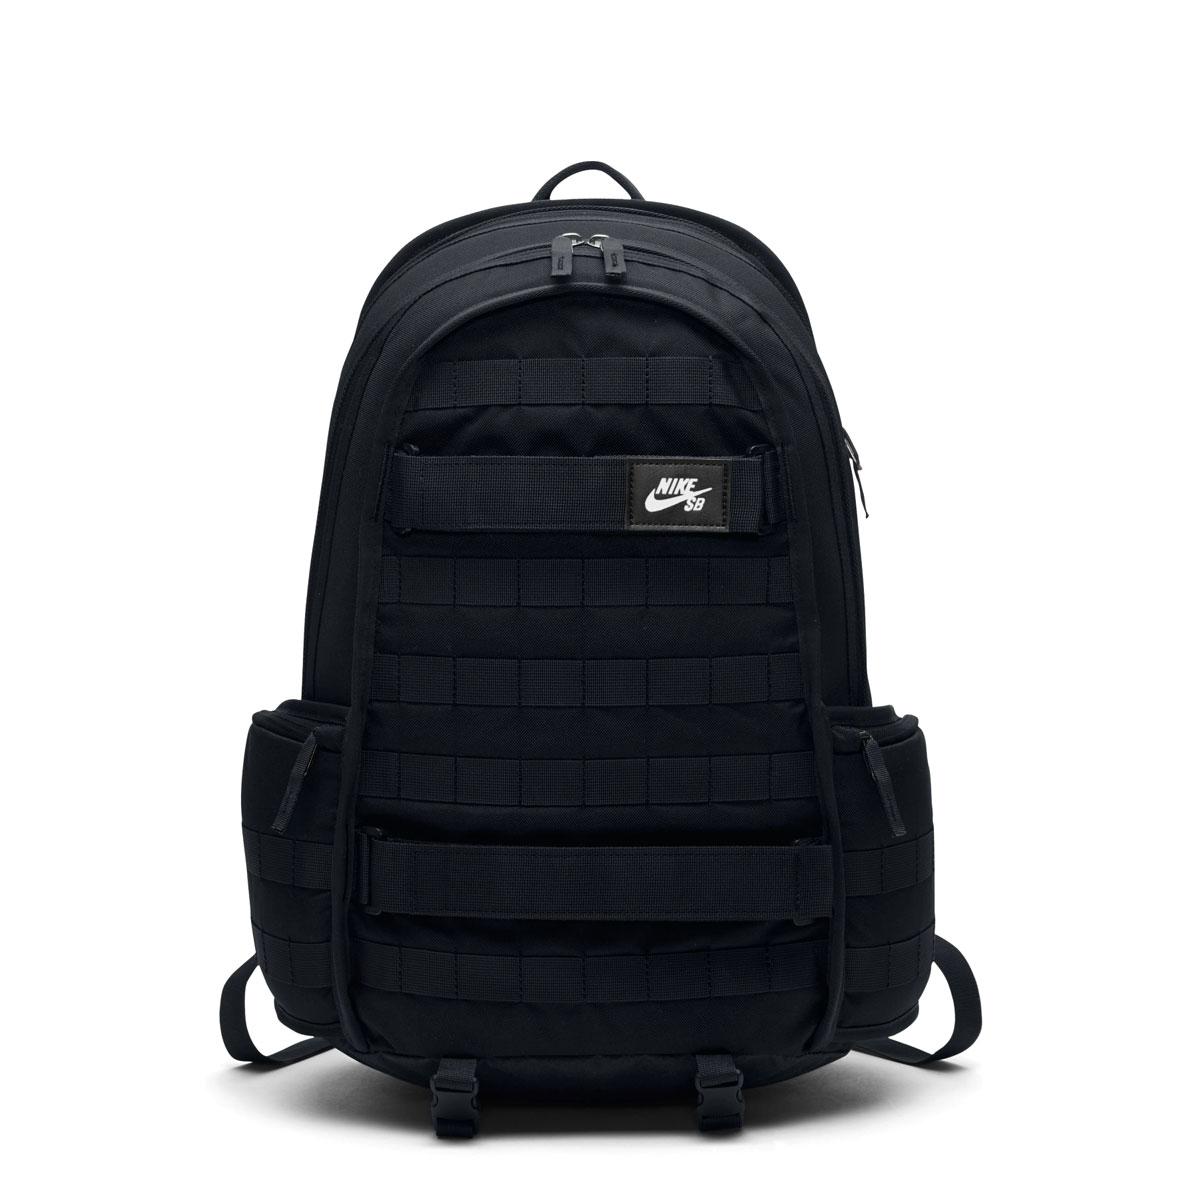 NIKE SB RPM BKPK - SOLID(ナイキ SB PRM バックパック)BLACK/BLACK/WHITE【リュック】18SU-I